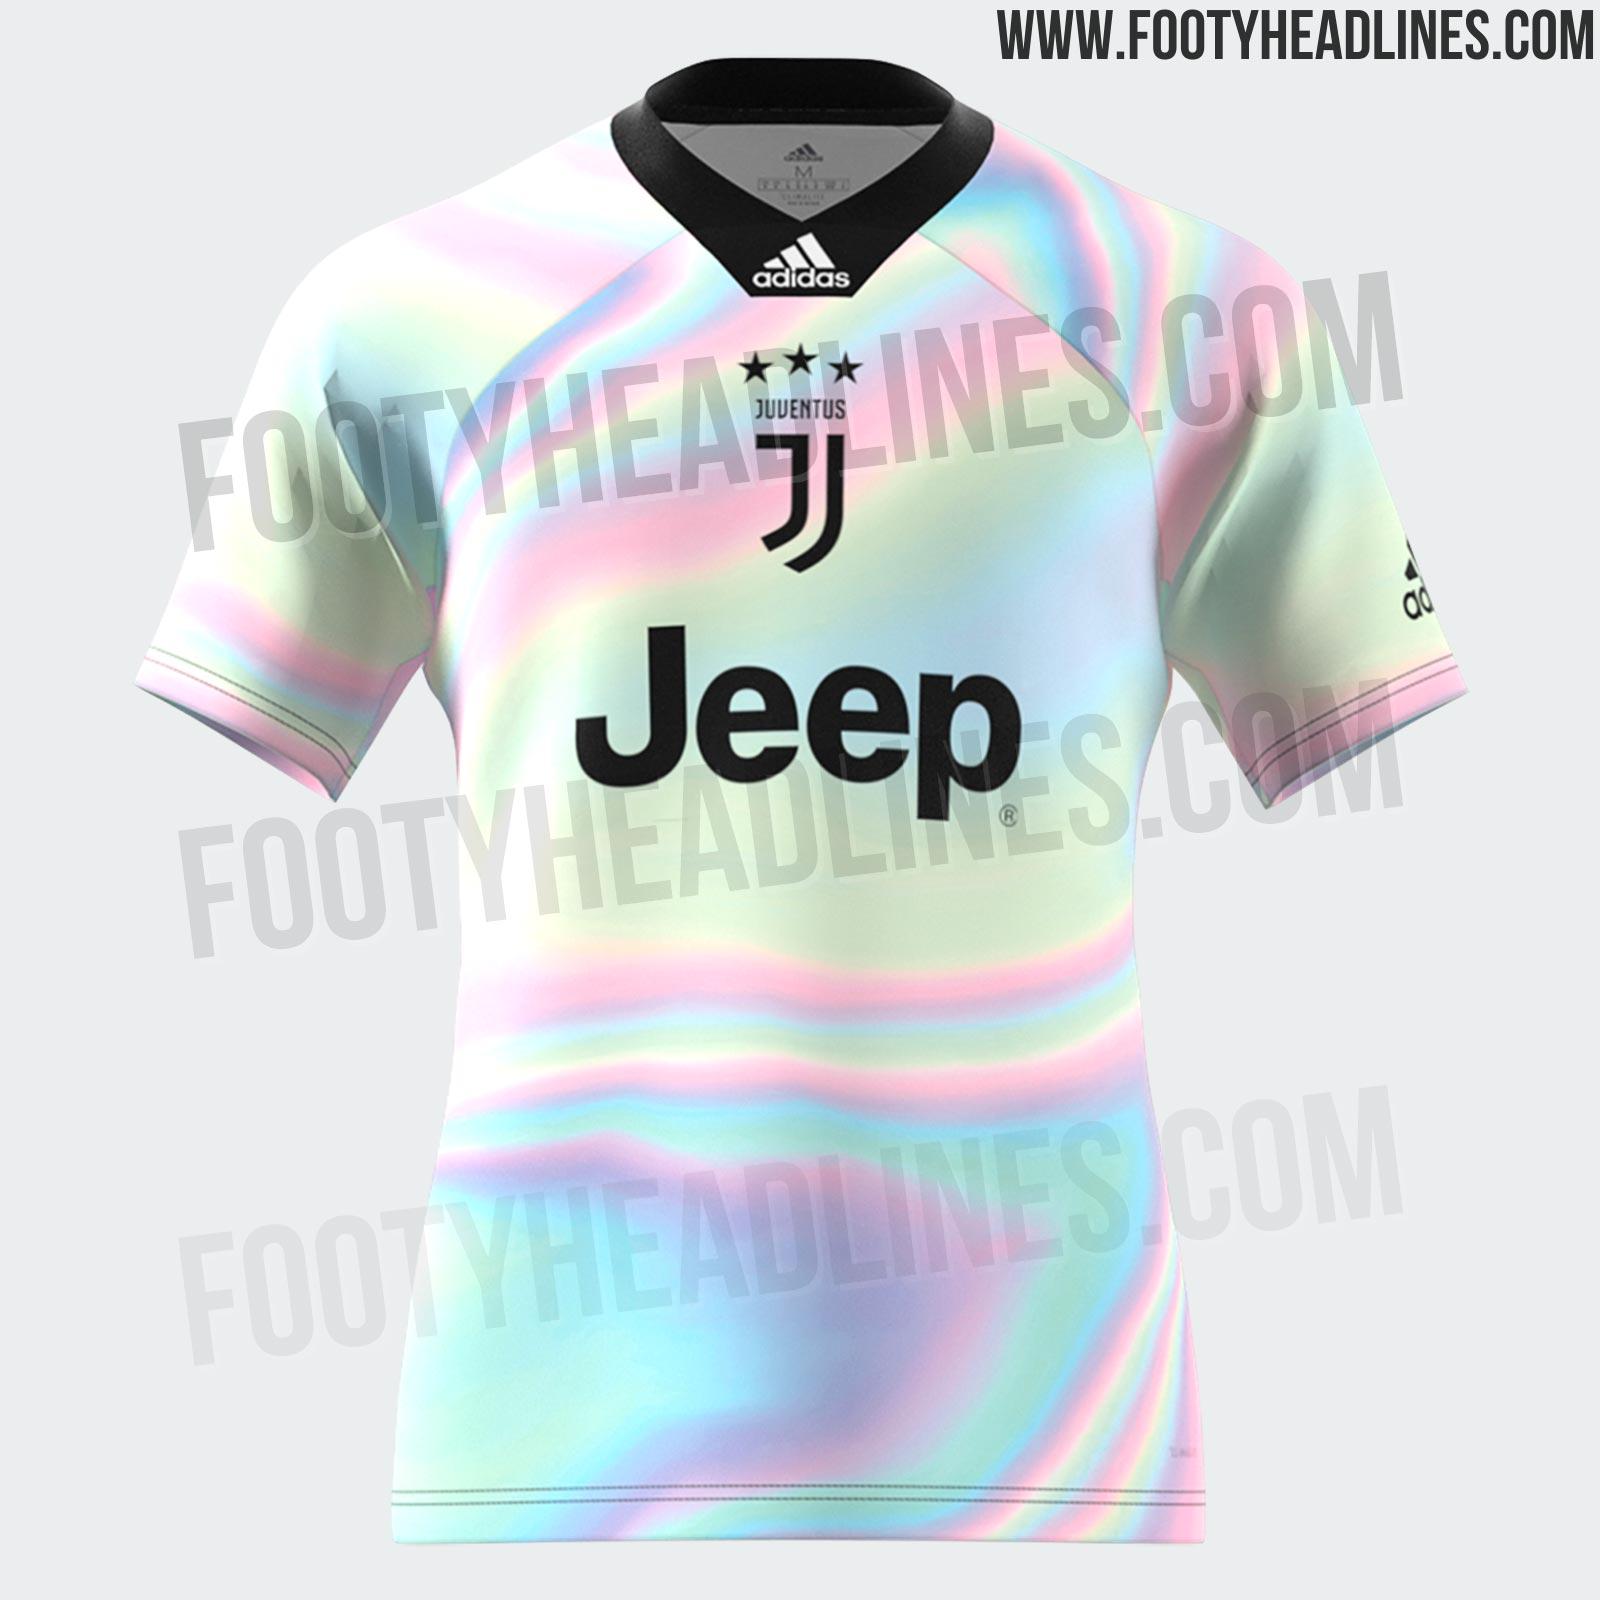 official photos 0004b 1828c Exclusive: Insane Adidas x EA Sports Juventus Kit Leaked ...